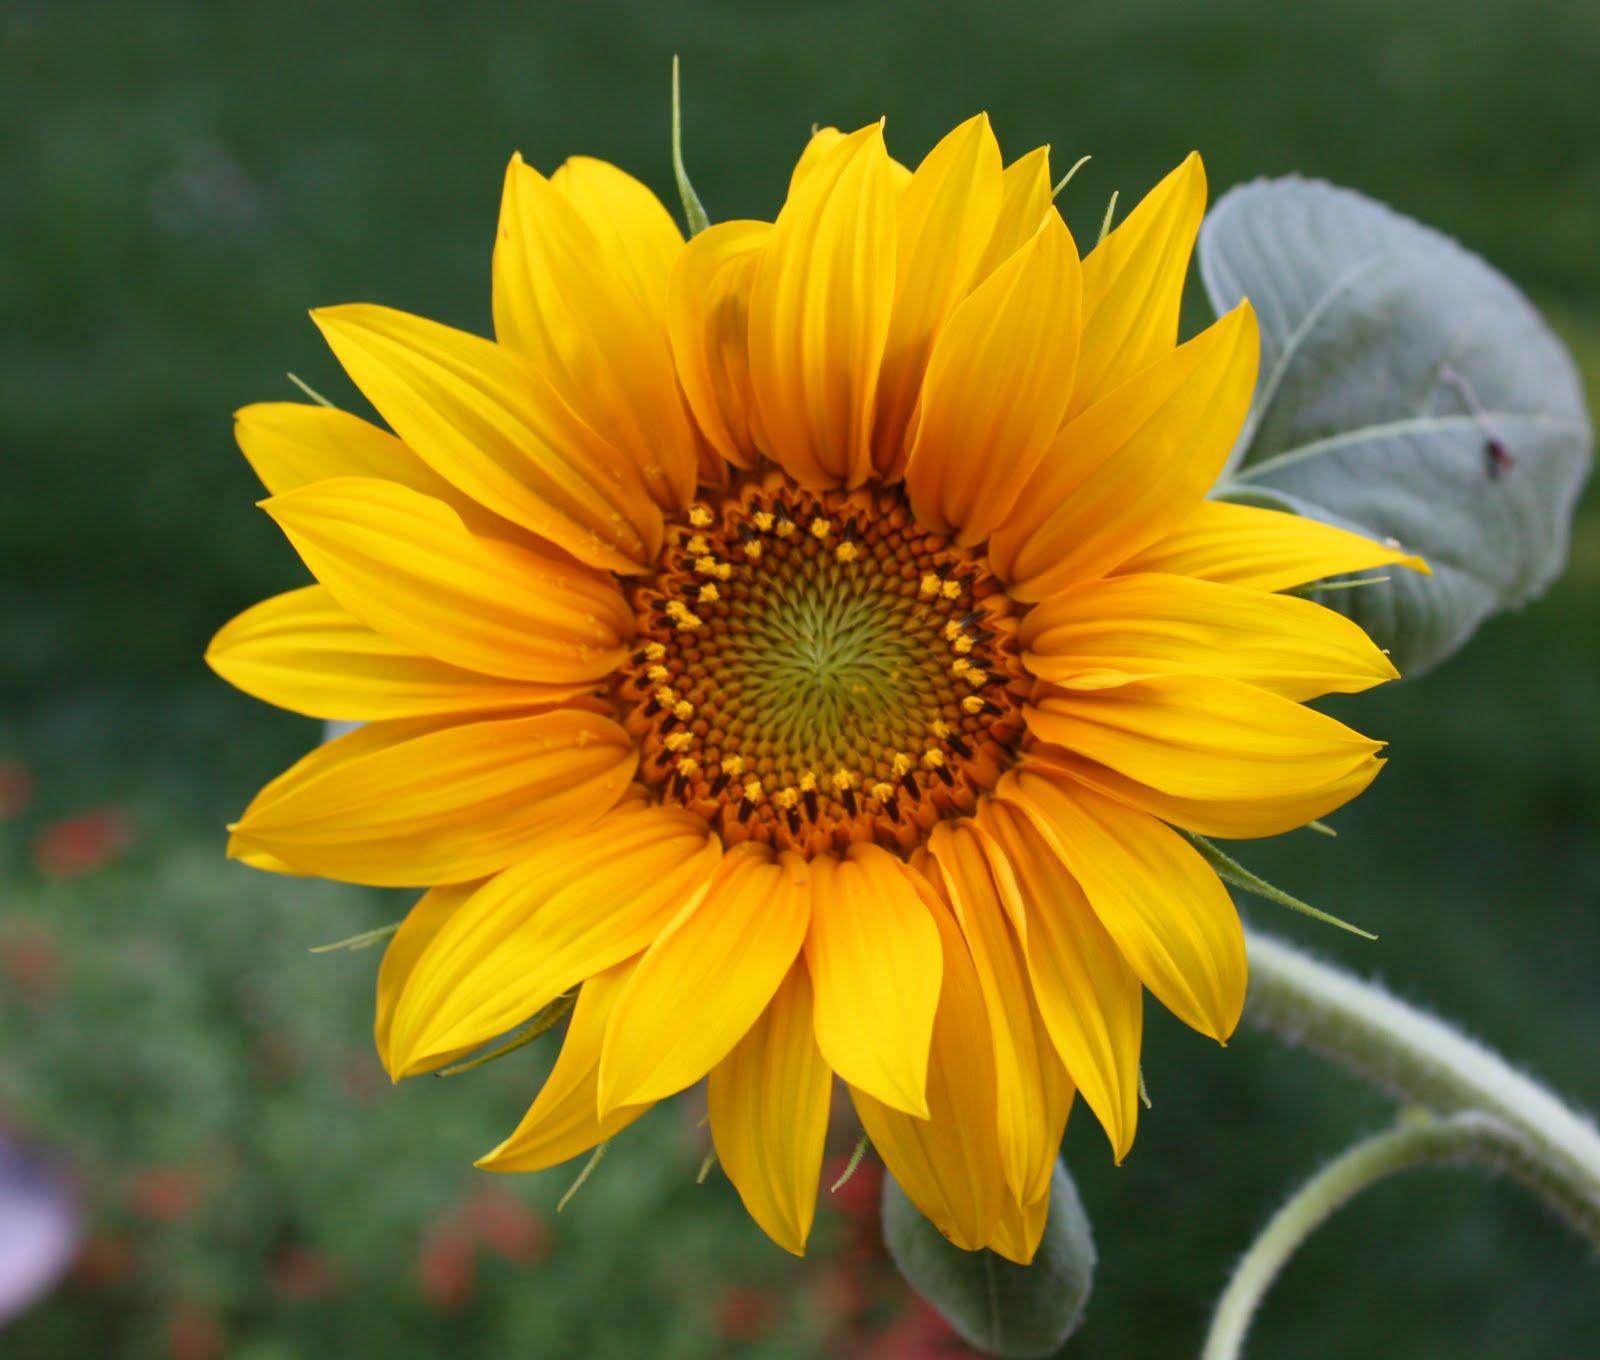 Koleksi Gambar Bunga Matahari Tercantik